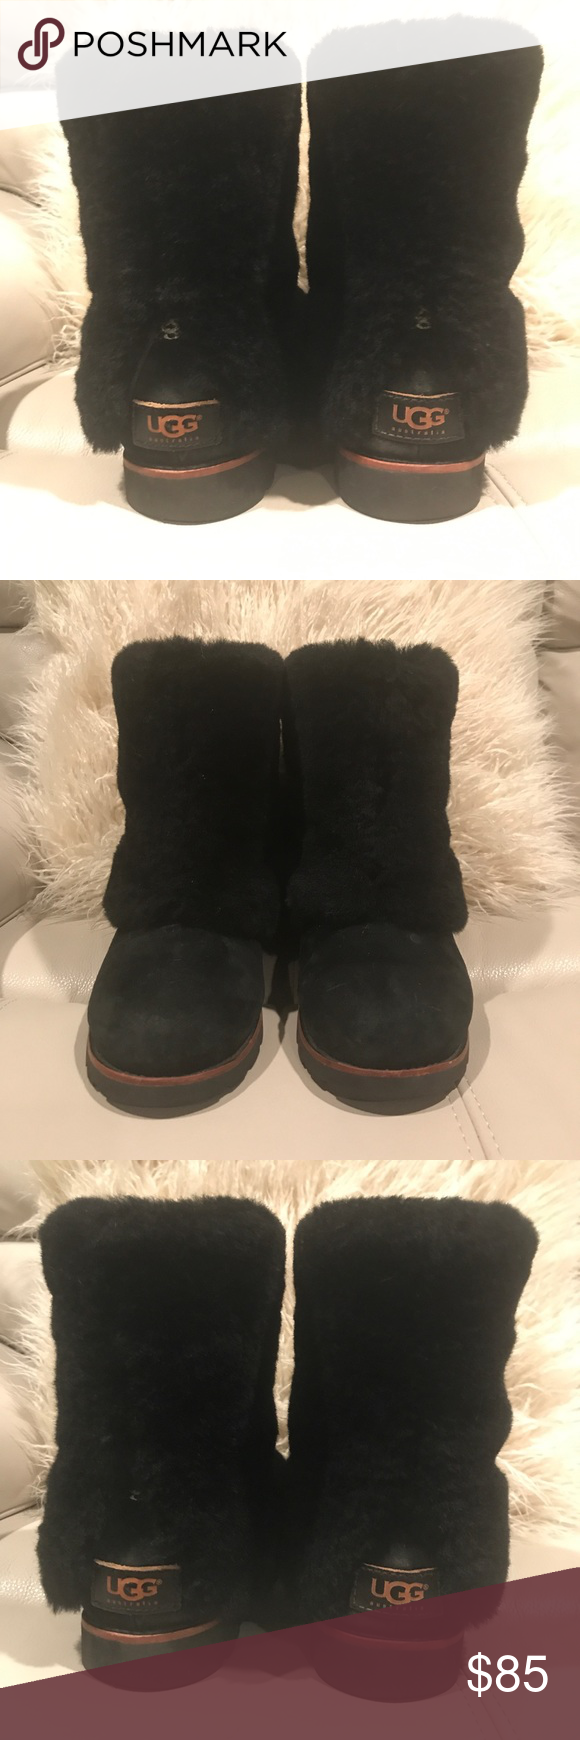 751d9224b0f Ugg Maylin boots. Black size 7 (see description) Ugg Australia ...